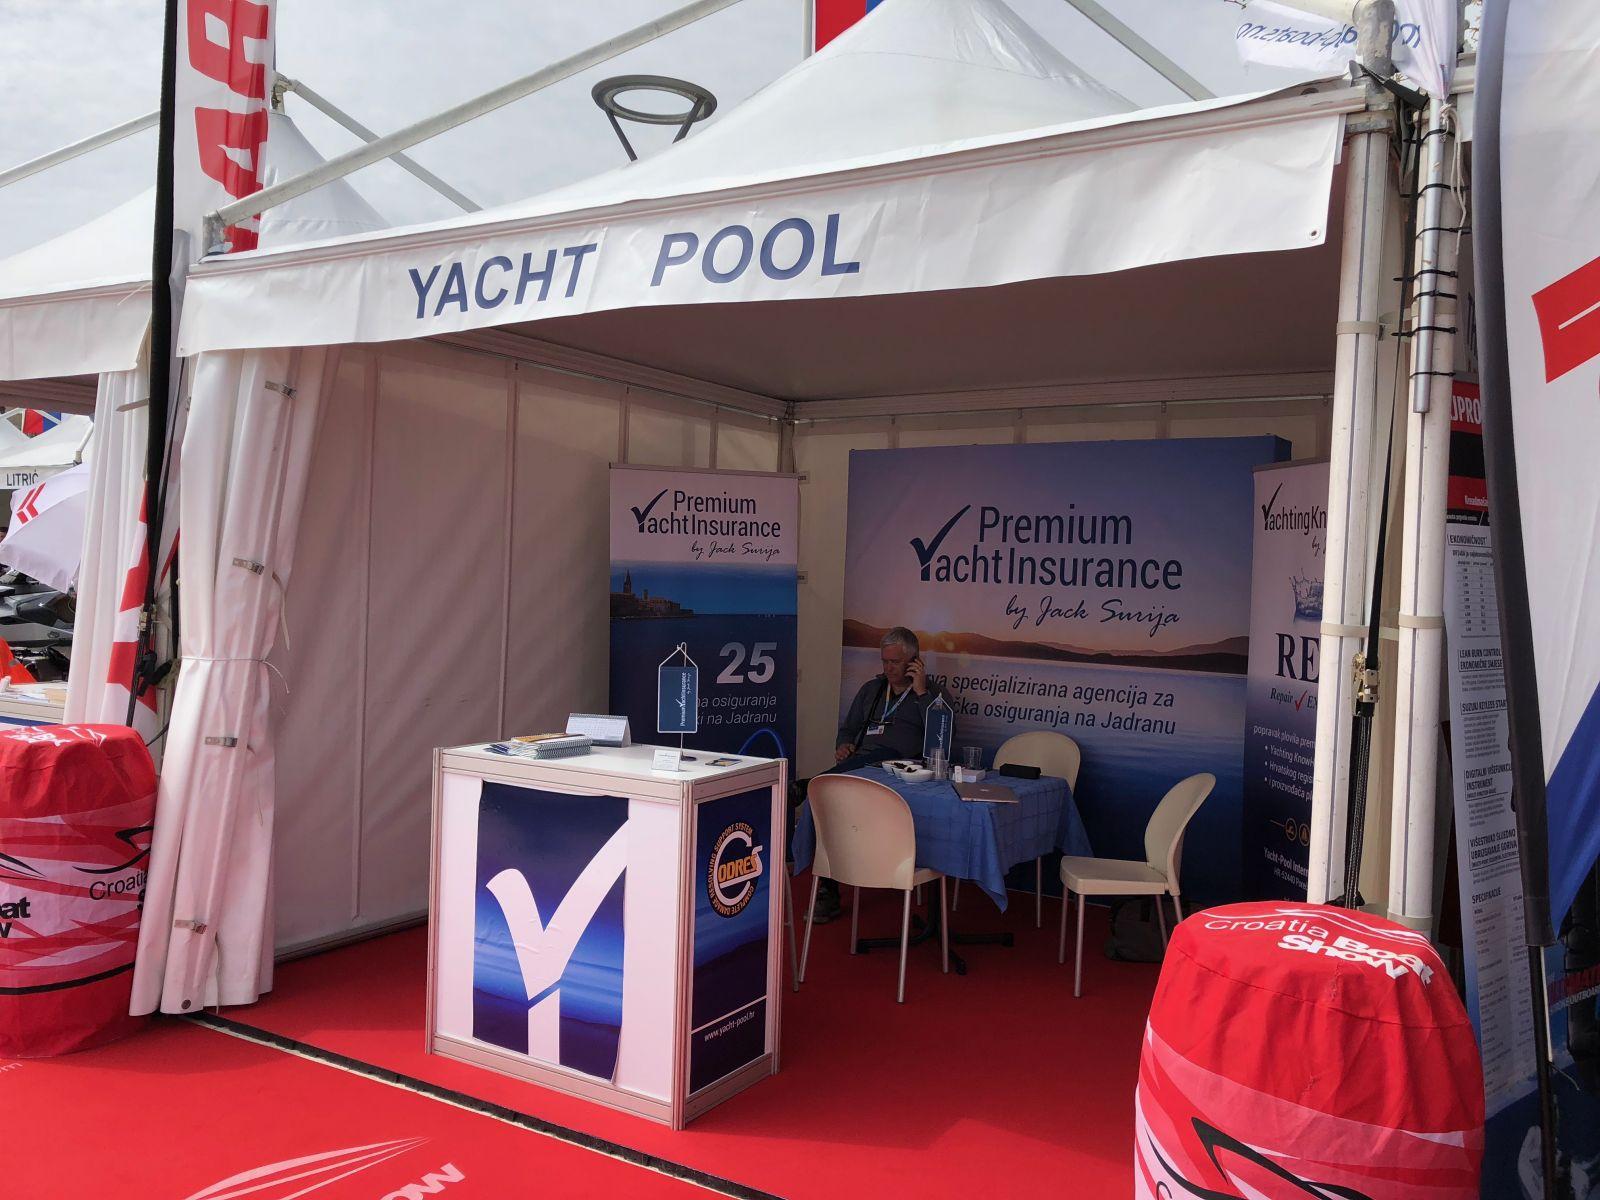 20. Croatia Boat Show Premium Yacht Insurance štand